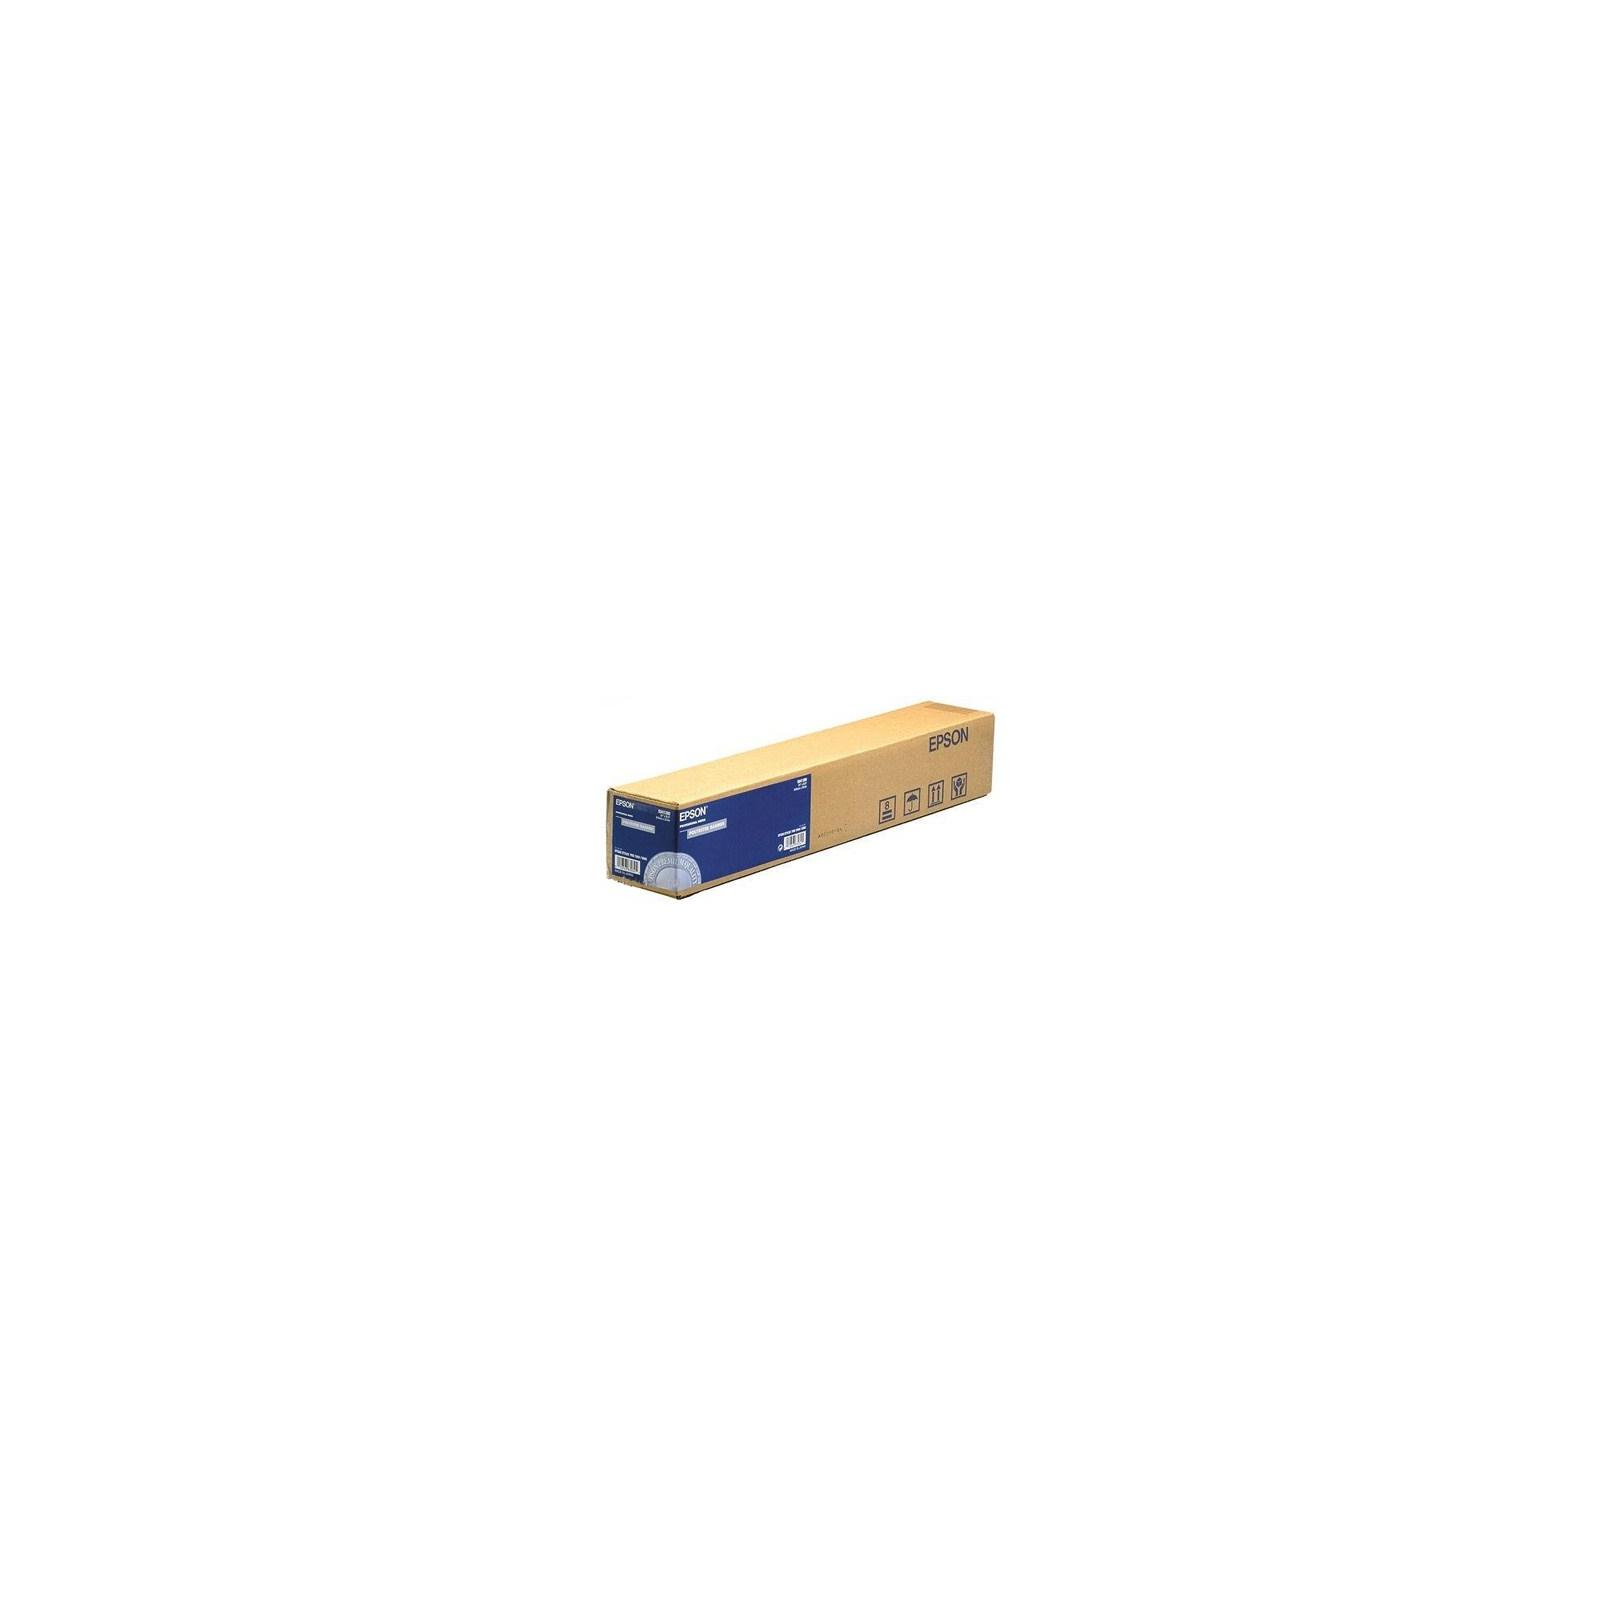 "Бумага EPSON 24"" Presentation Paper HiRes (C13S045287)"